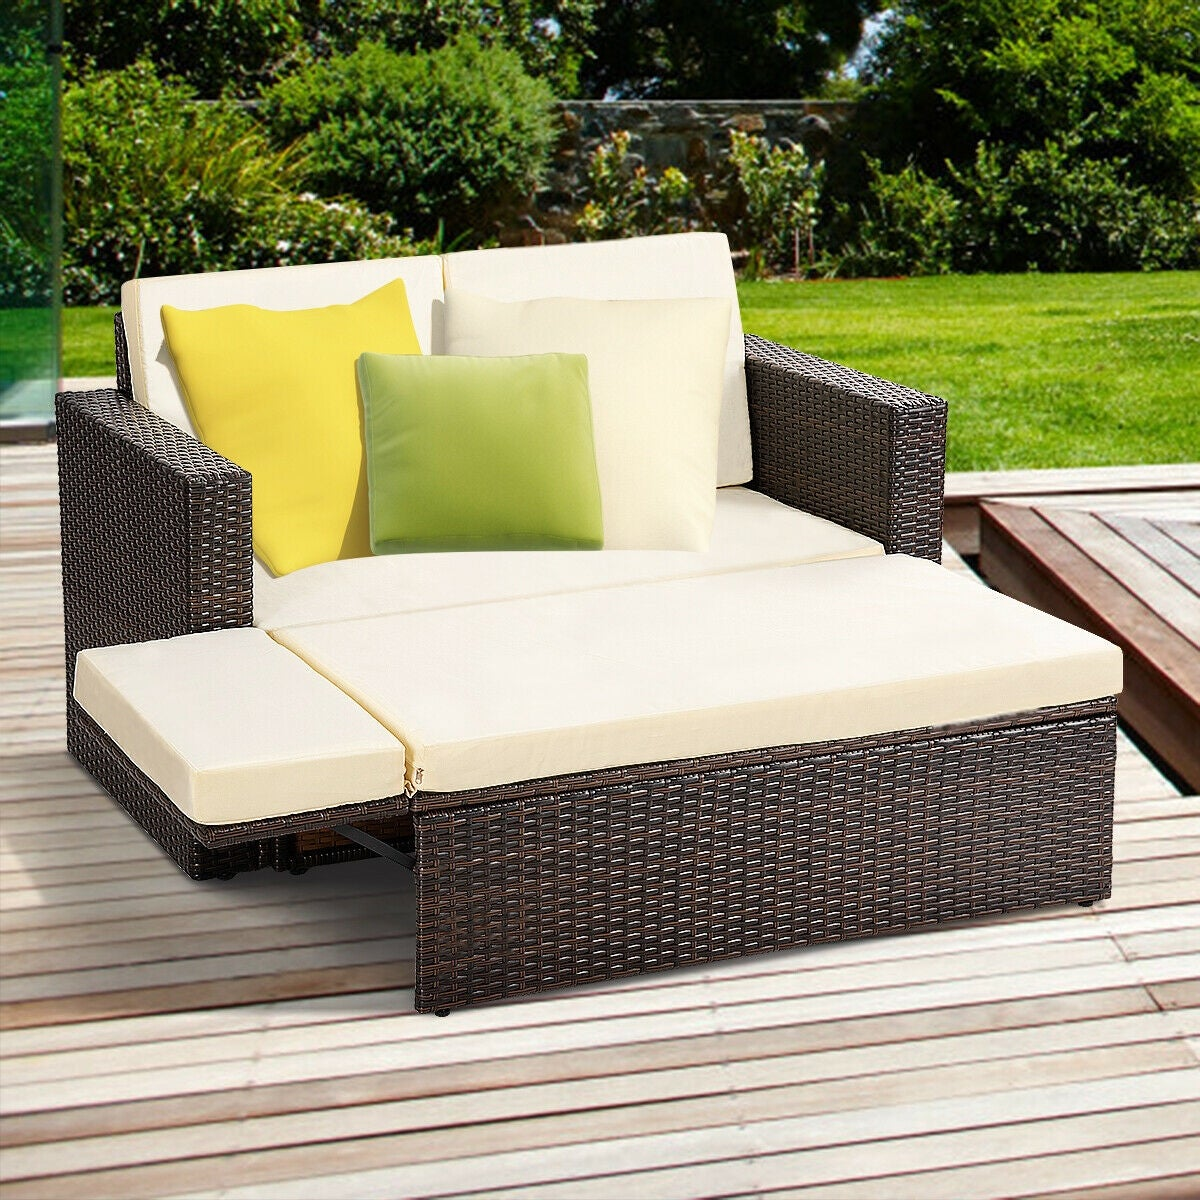 Wondrous Gymax 2Pcs Patio Rattan Loveseat Sofa Ottoman Daybed Garden Furniture Set W Cushions Creativecarmelina Interior Chair Design Creativecarmelinacom